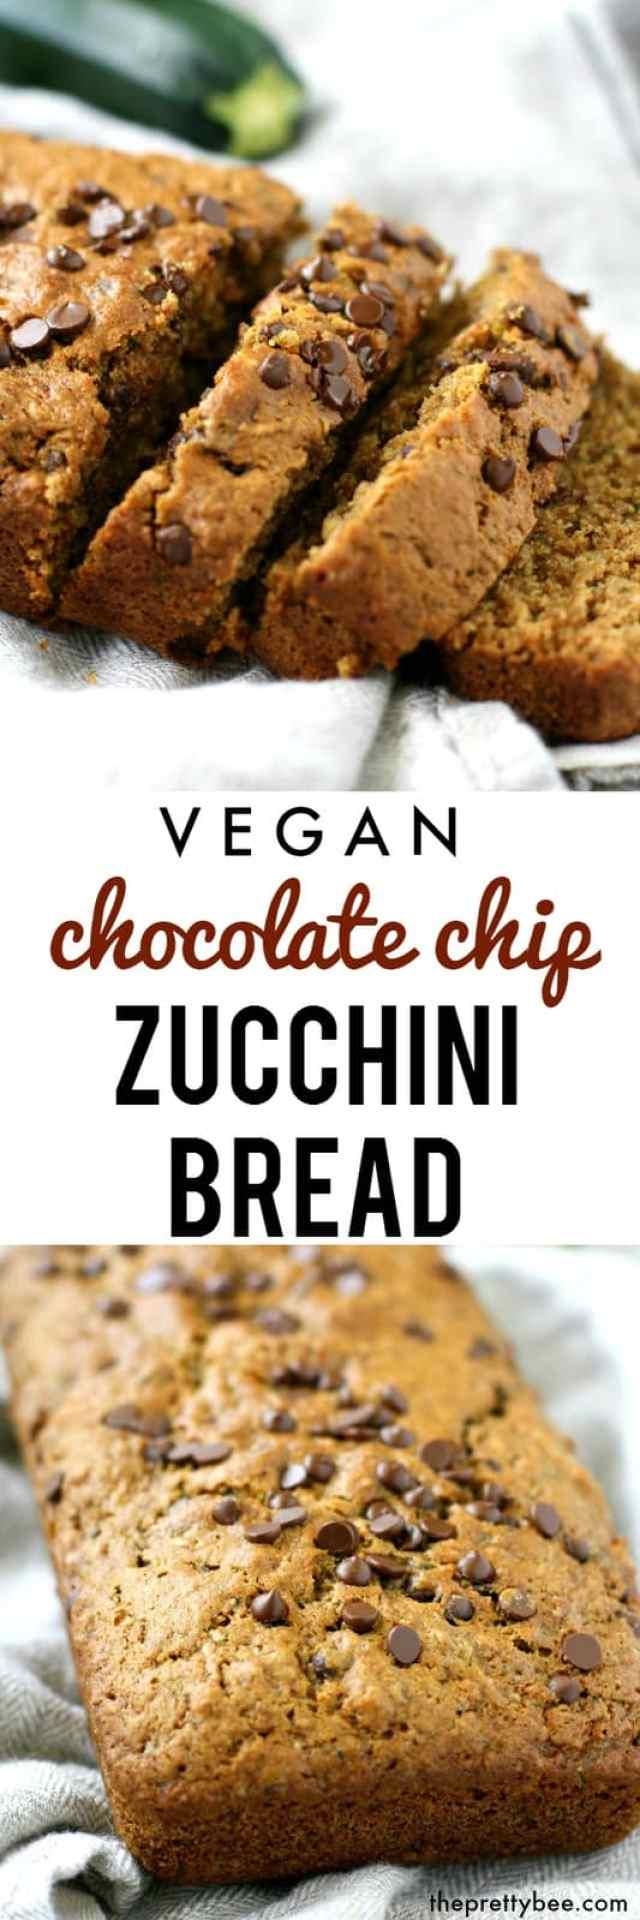 Vegan Chocolate Chip Zucchini Bread. - The Pretty Bee